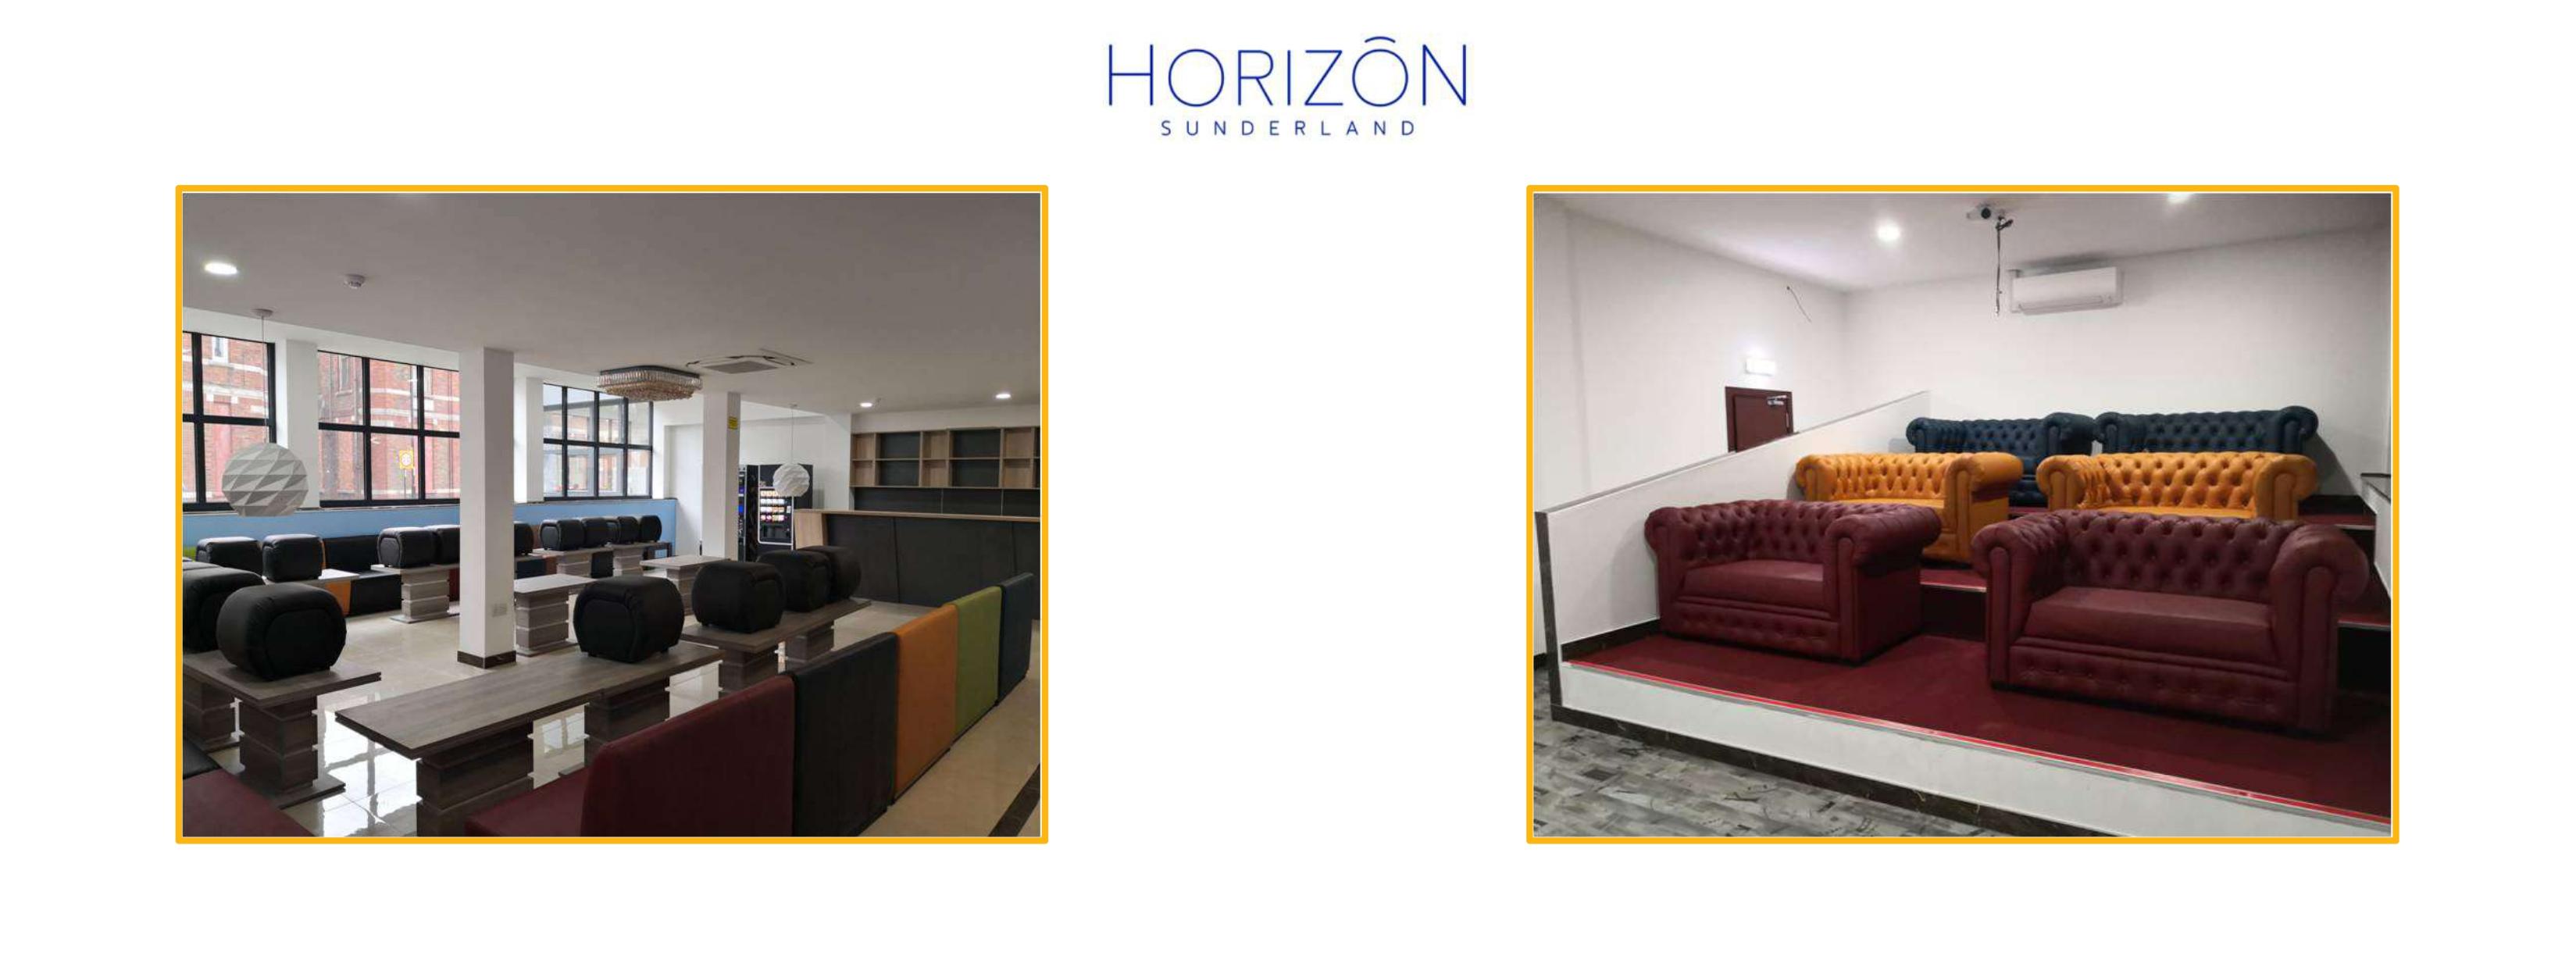 Horizon Sunderland -Ahmet Ziyal_v02_page-0008